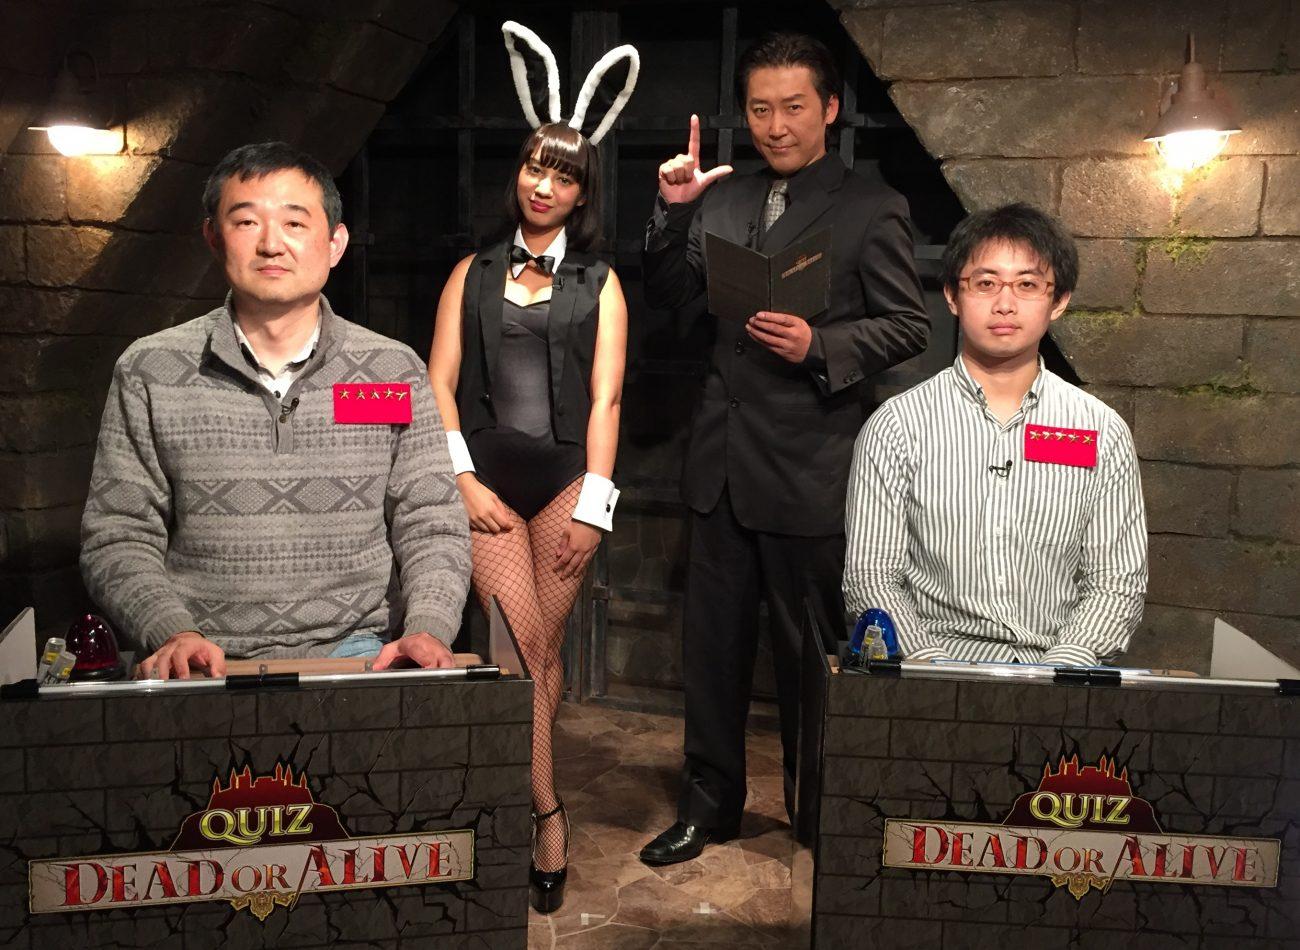 QUIZ JAPAN TVのオリジナルクイズ番組「QUIZ DEAD OR ALIVE」#21は遠藤聡と徳久倫康が激突!